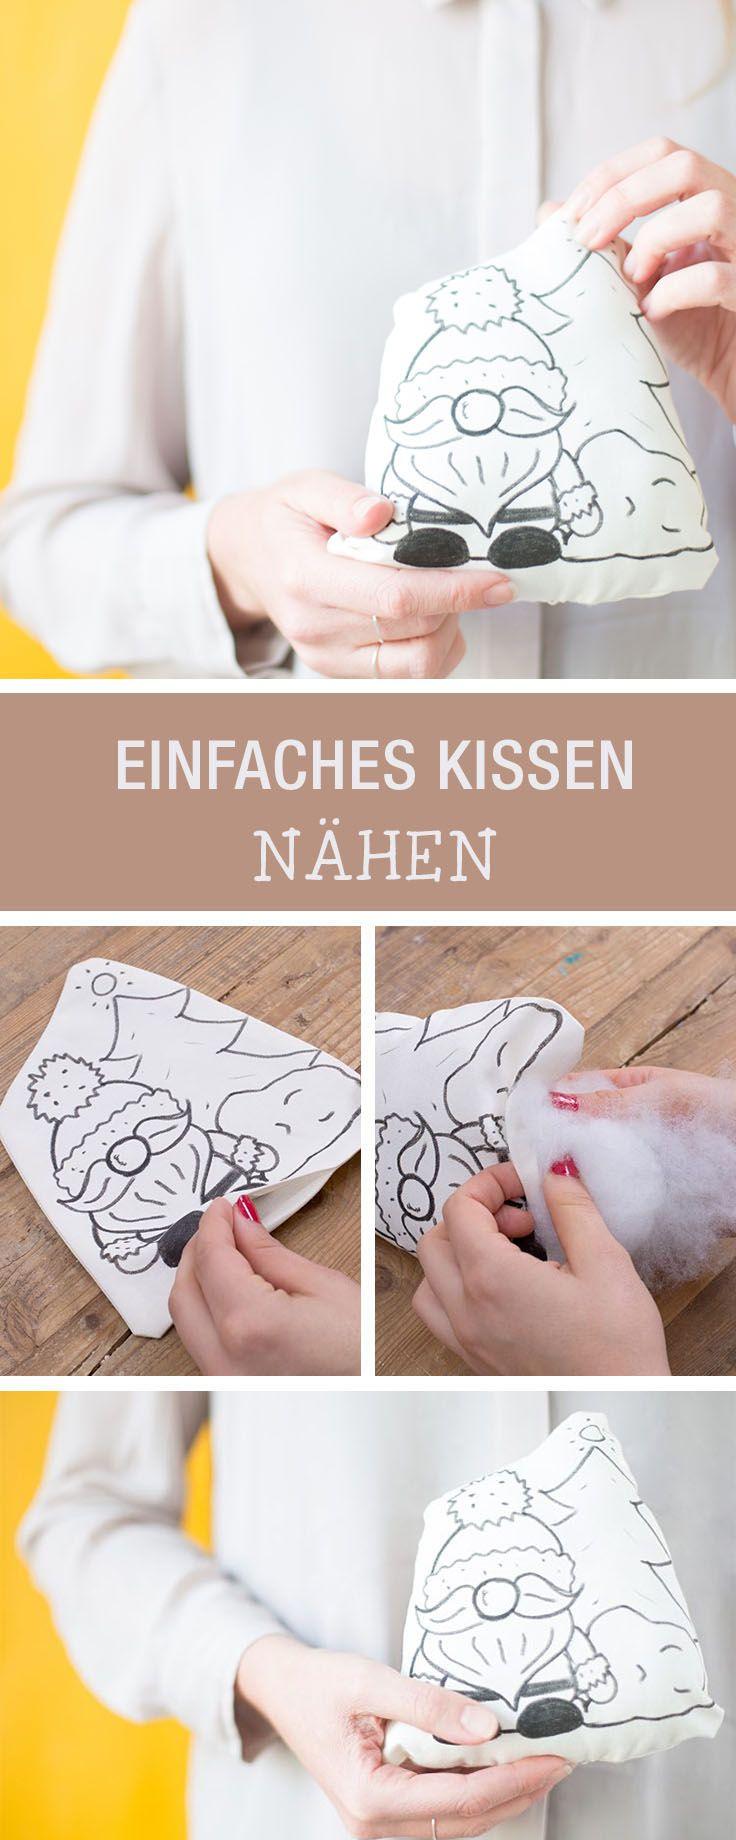 DIY-Anleitung: Einfaches Weihnachtskissen nähen via DaWanda.com